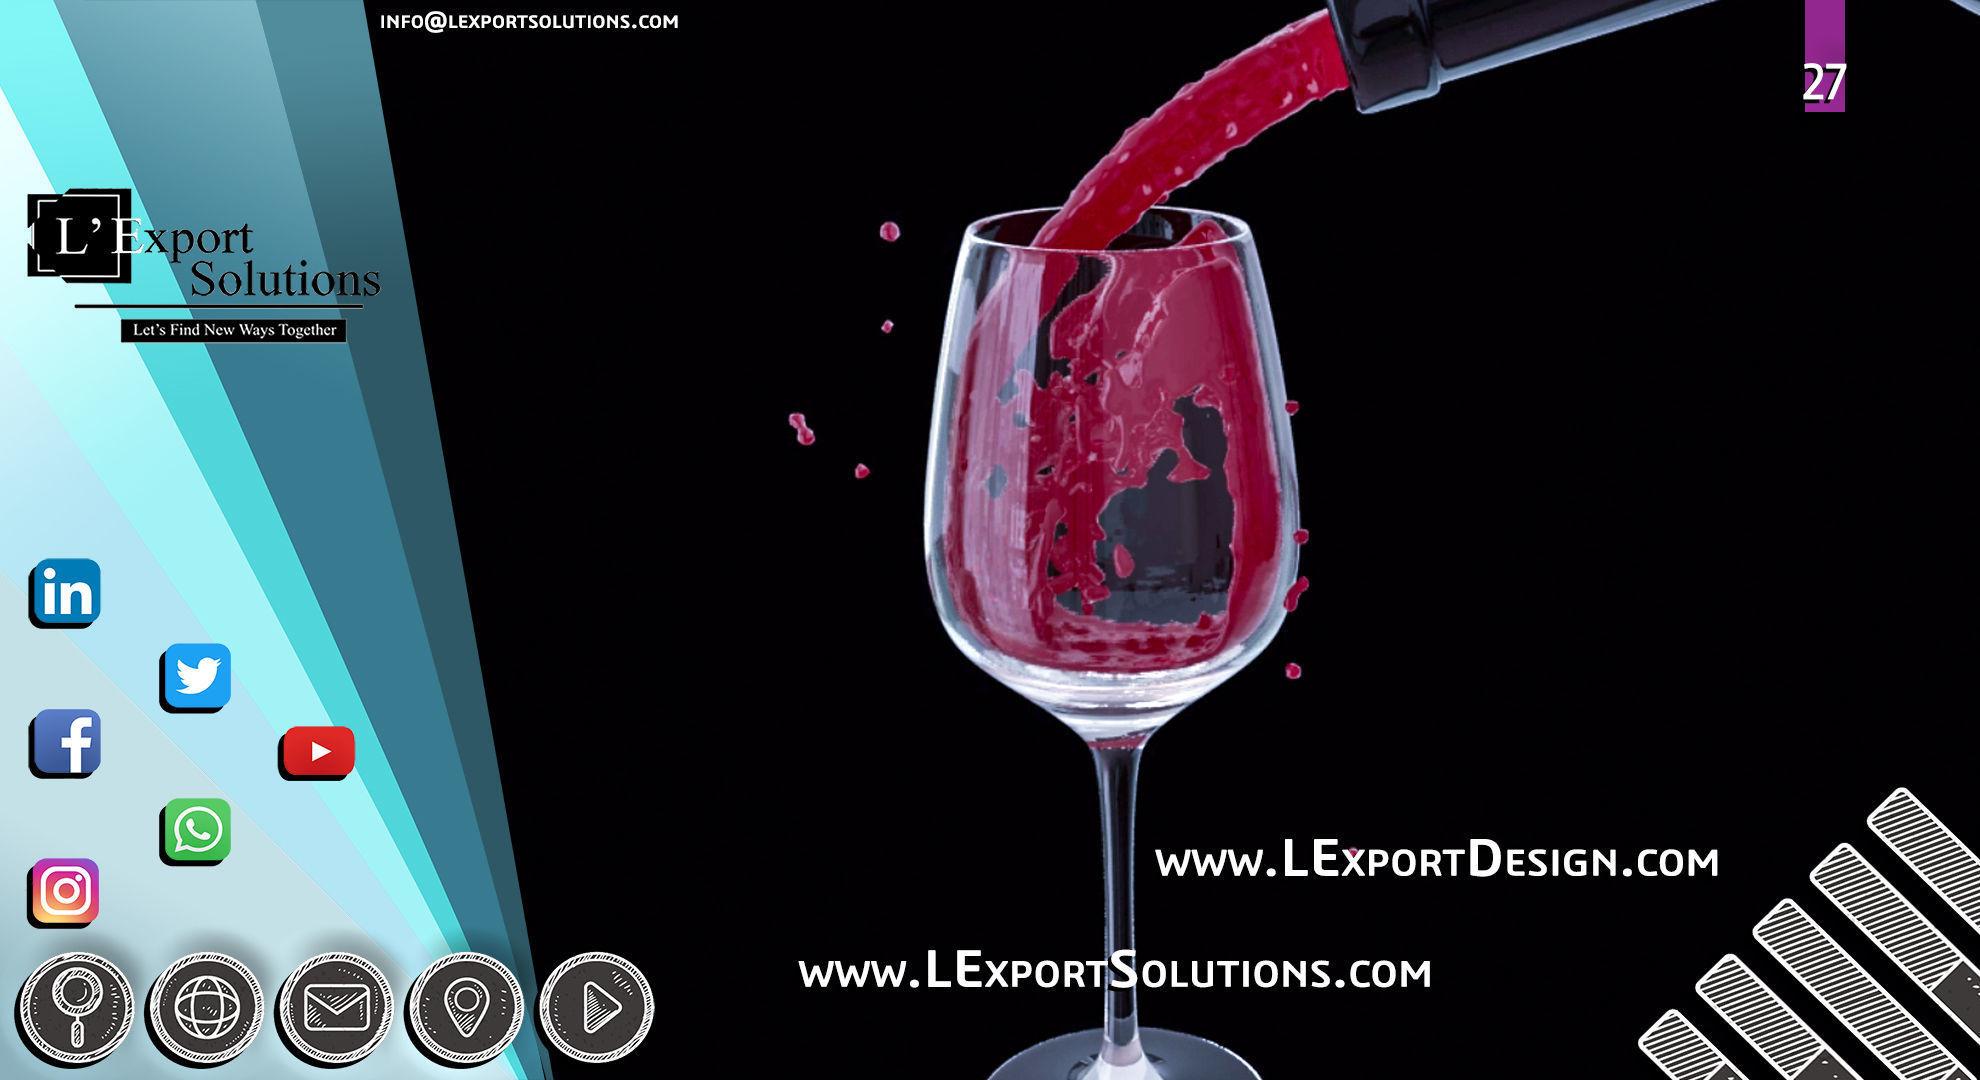 Wine - Animation Cinema 4D - LExport Solutions | 3D model